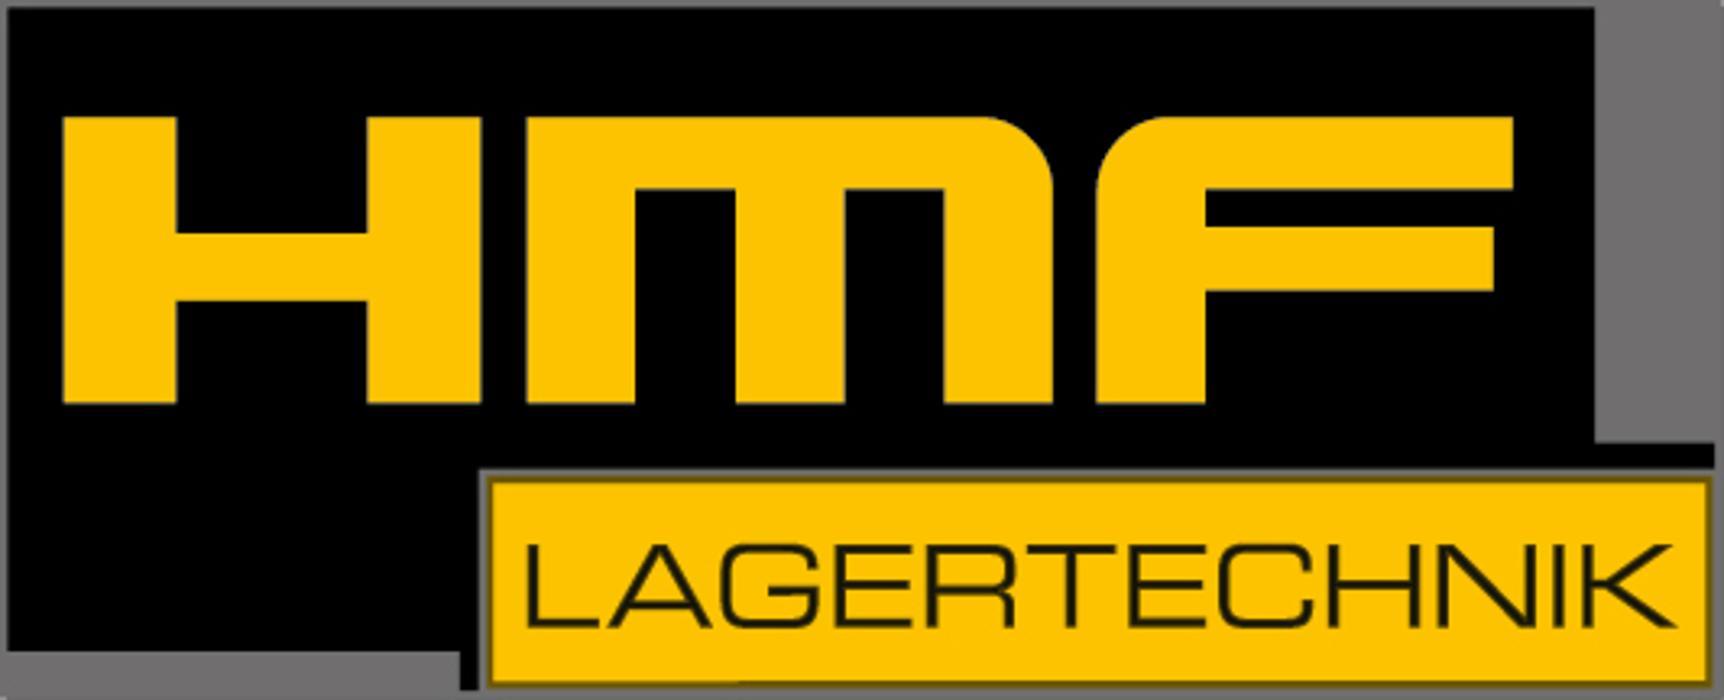 HMF LAGERTECHNIK Horst Maurer GmbH in Freiburg im Breisgau